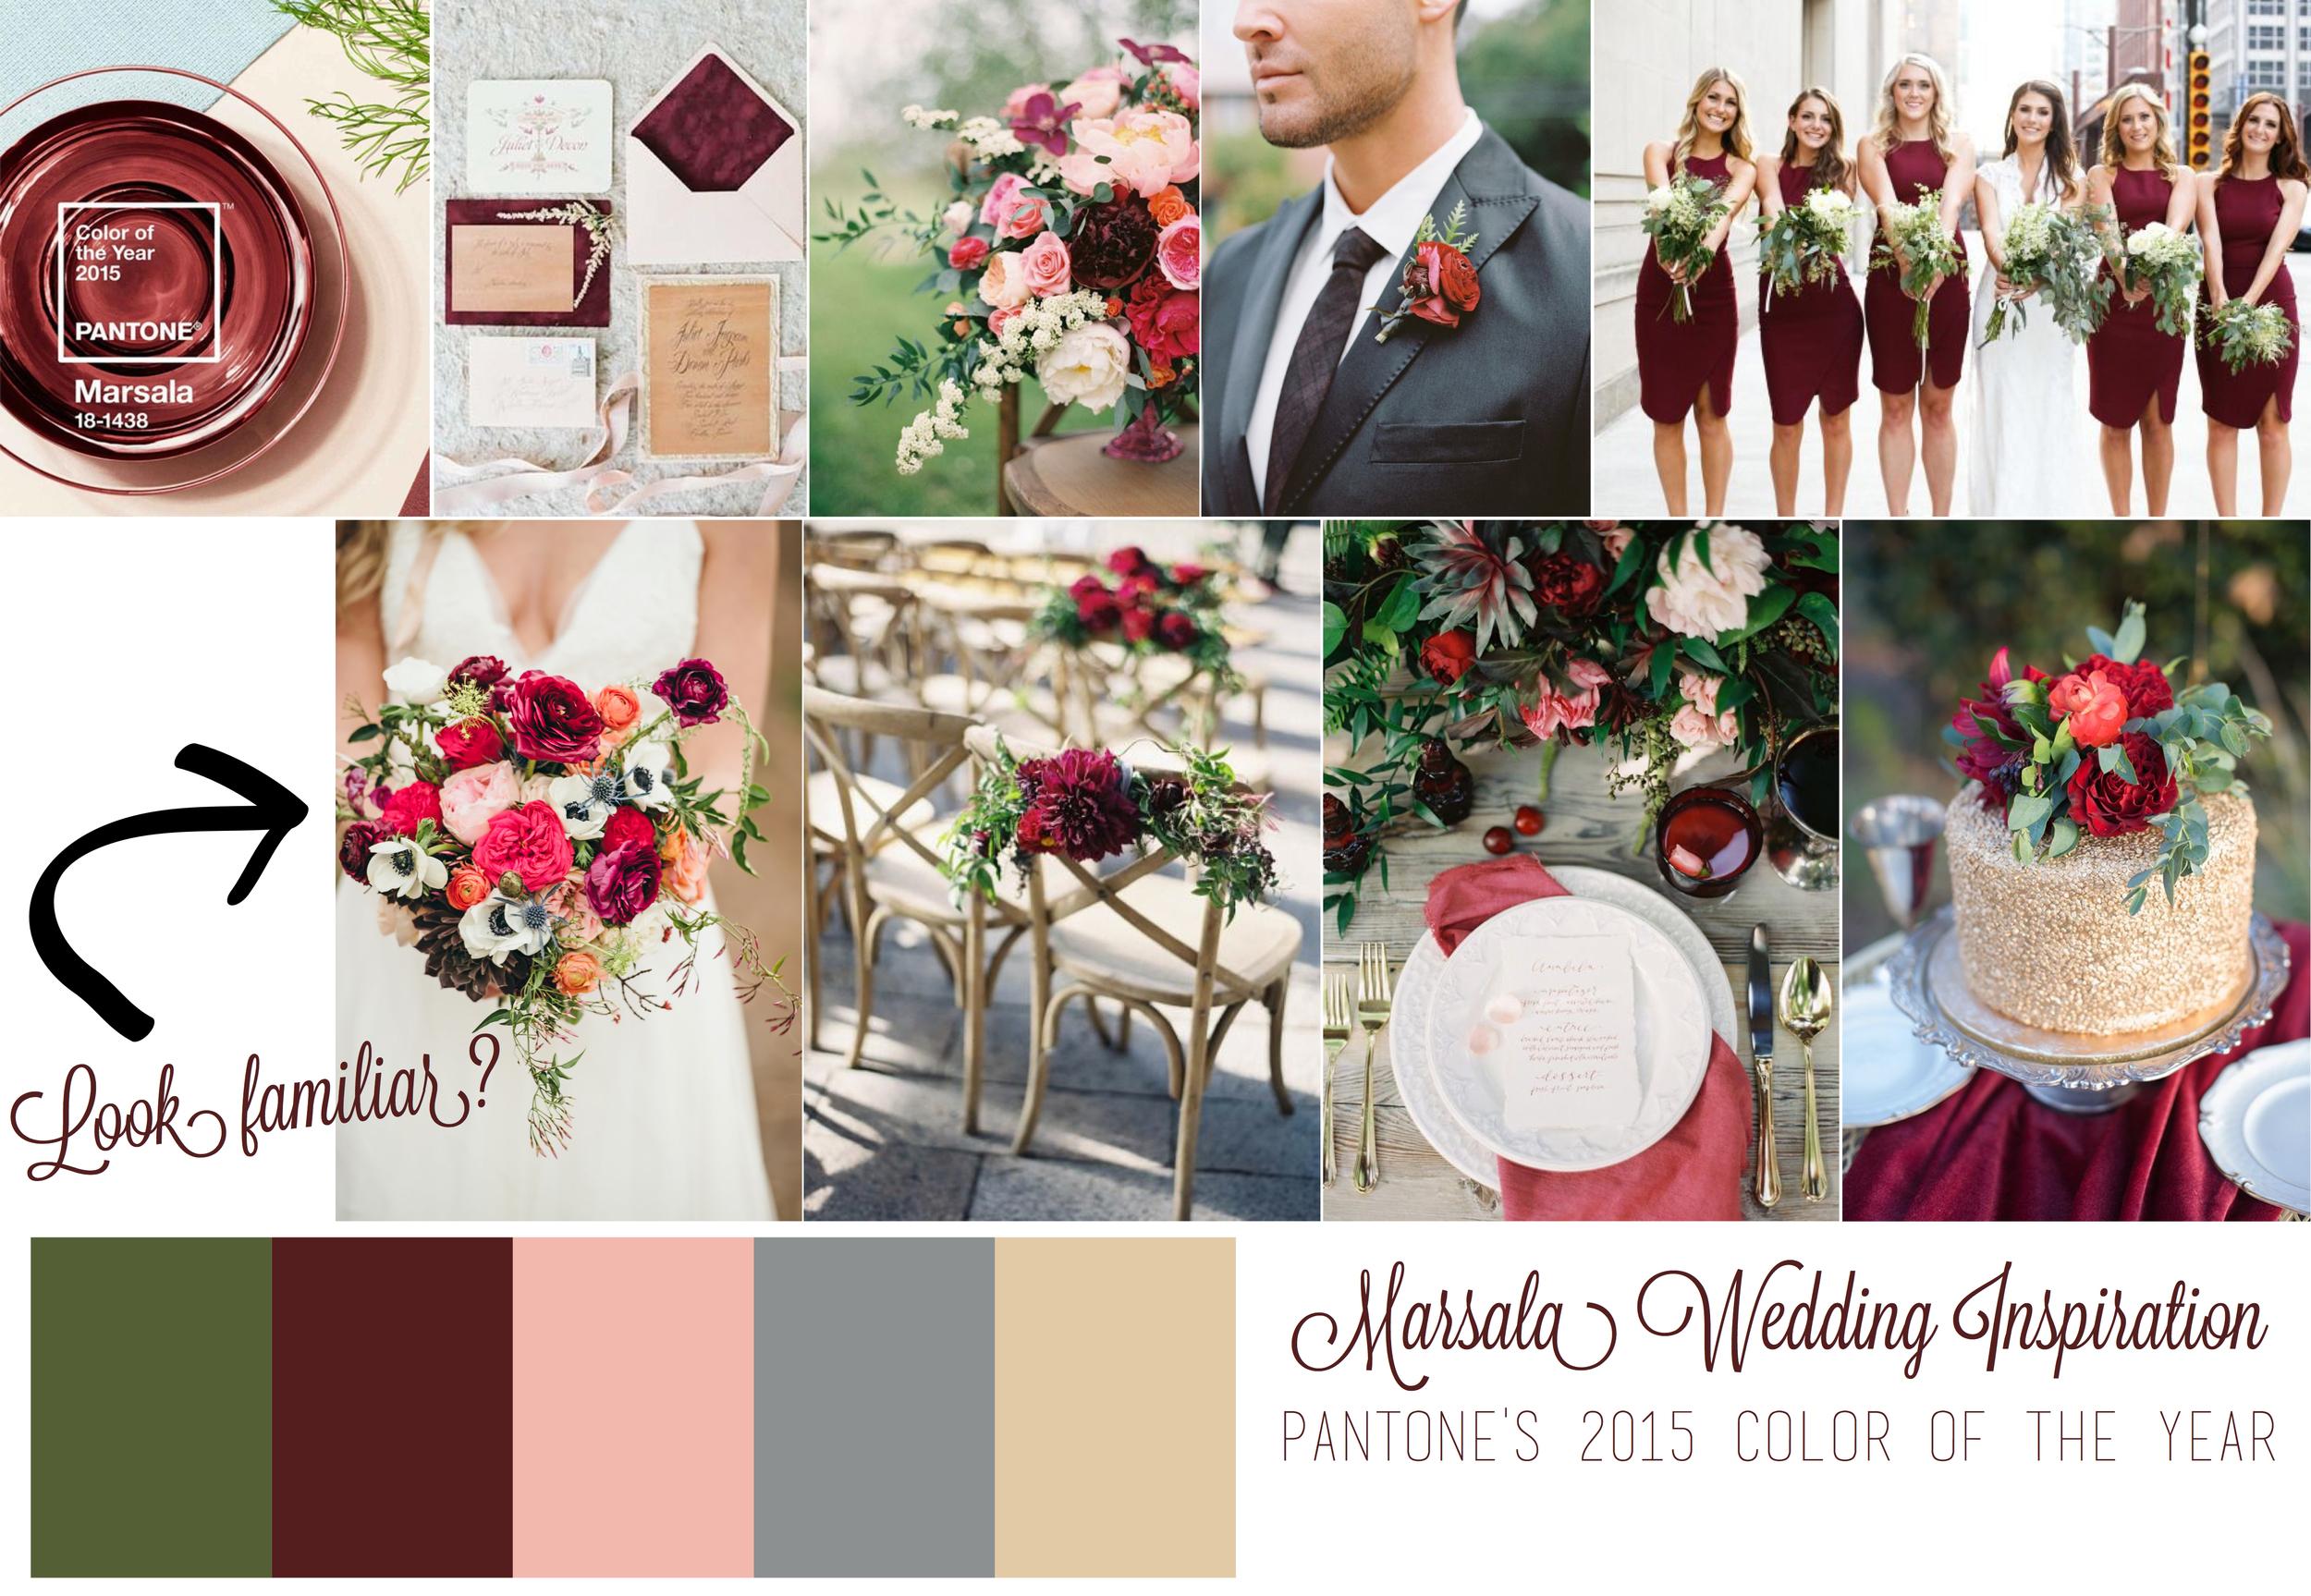 Marsala_Wedding_Inspiration_The_Graceful_Host.jpg